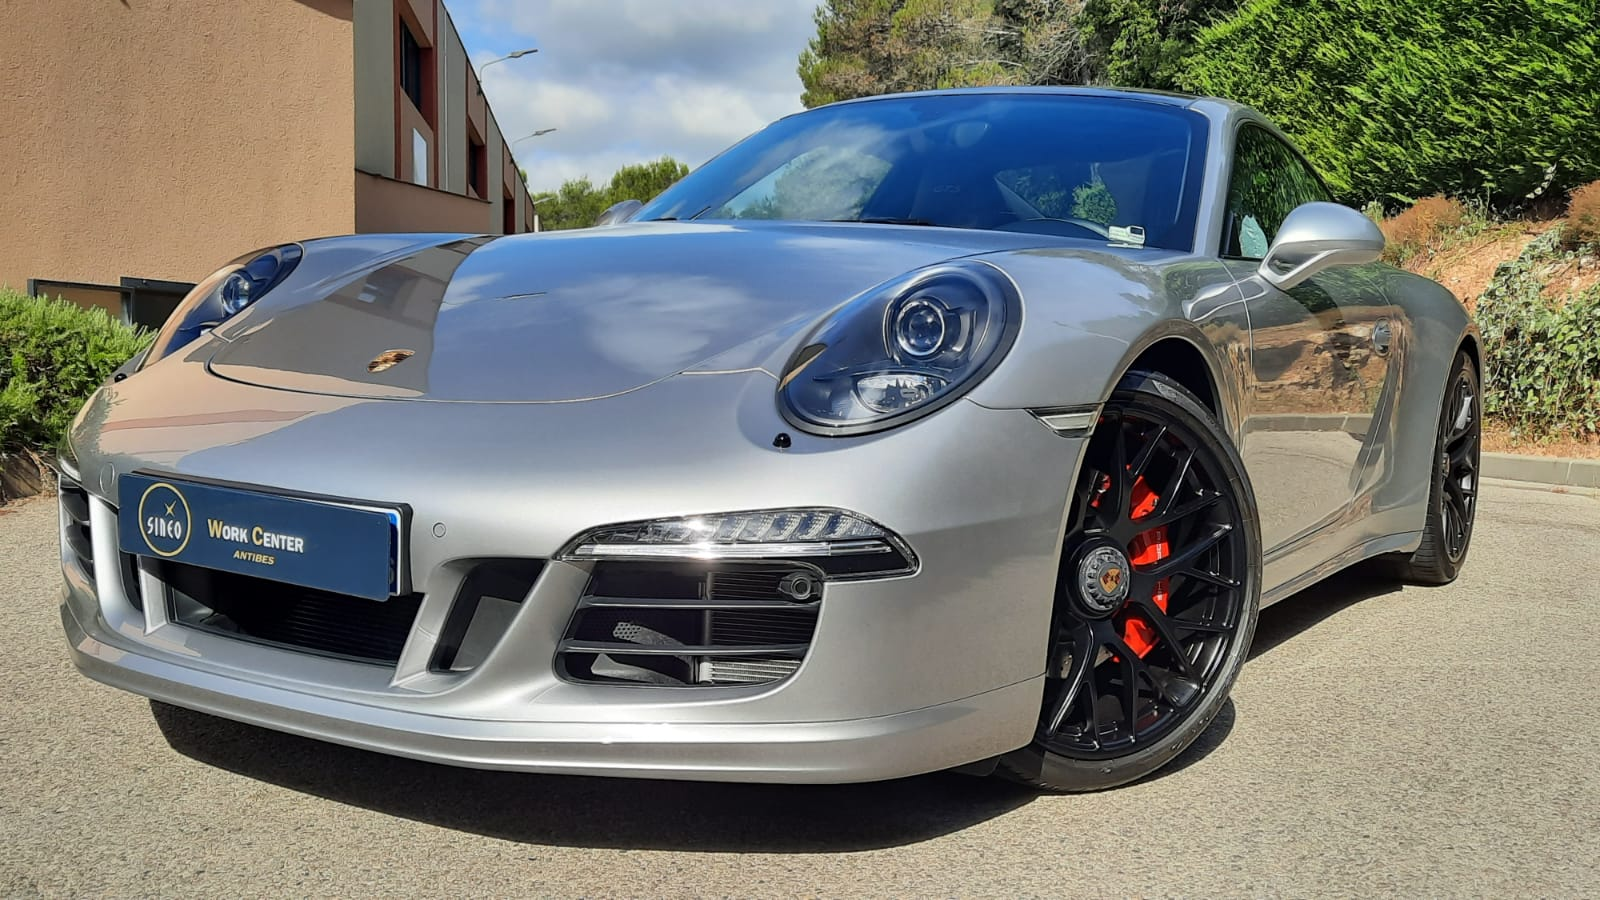 Pose traitement carrosserie Ceramic-Guard Si Carbon Cartec sur Porsche 911 GTS Carrera 4 Type 991